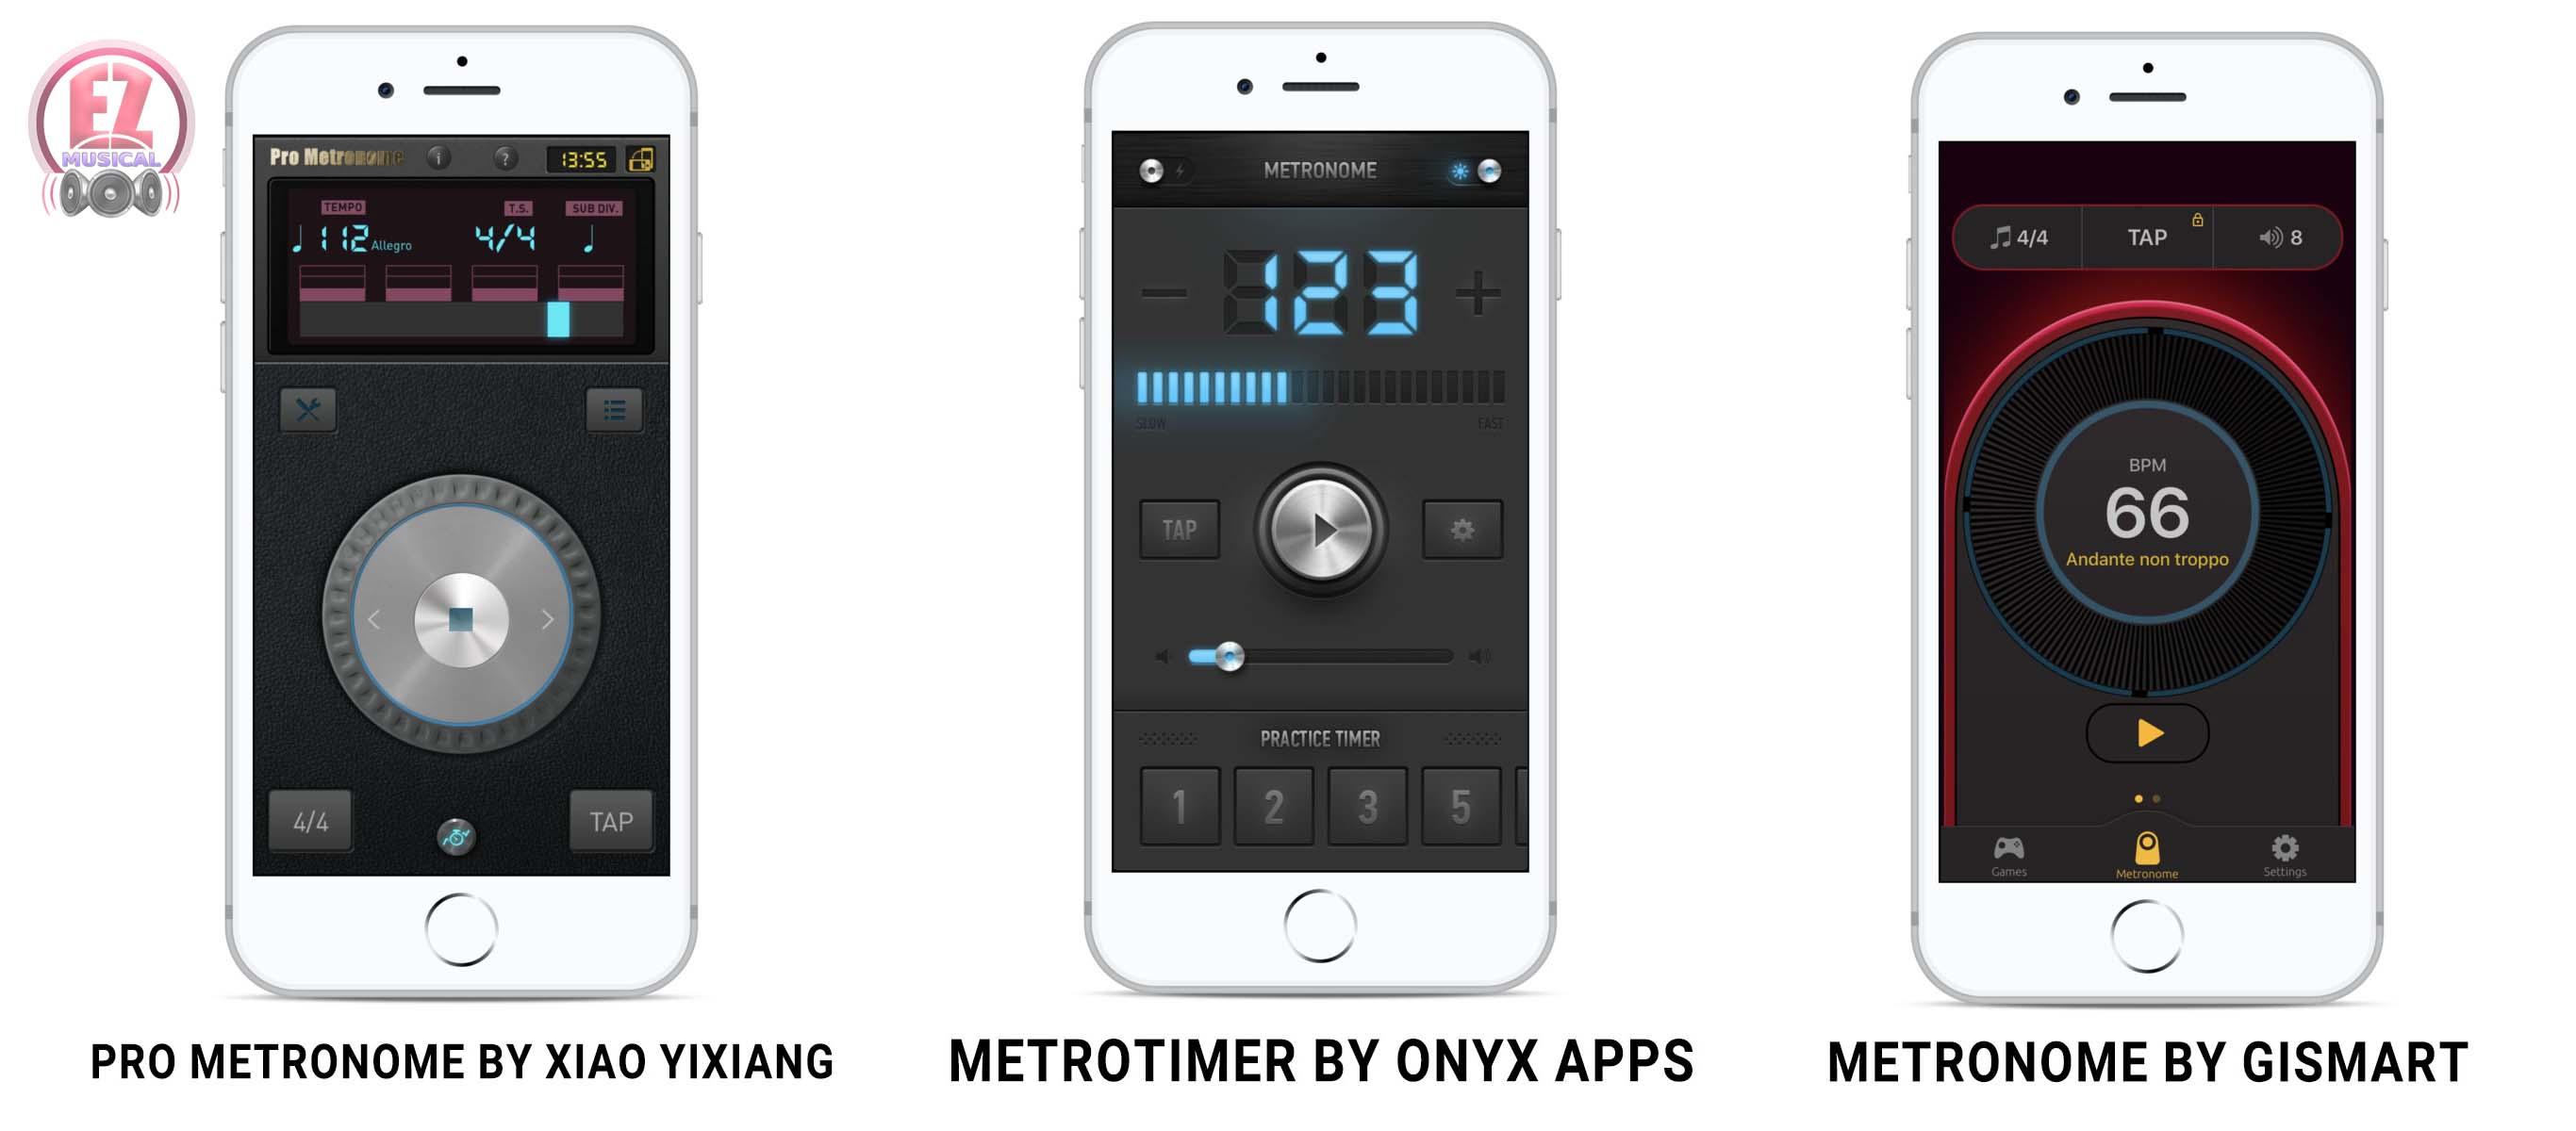 Metronome app 1 مترونوم چیست